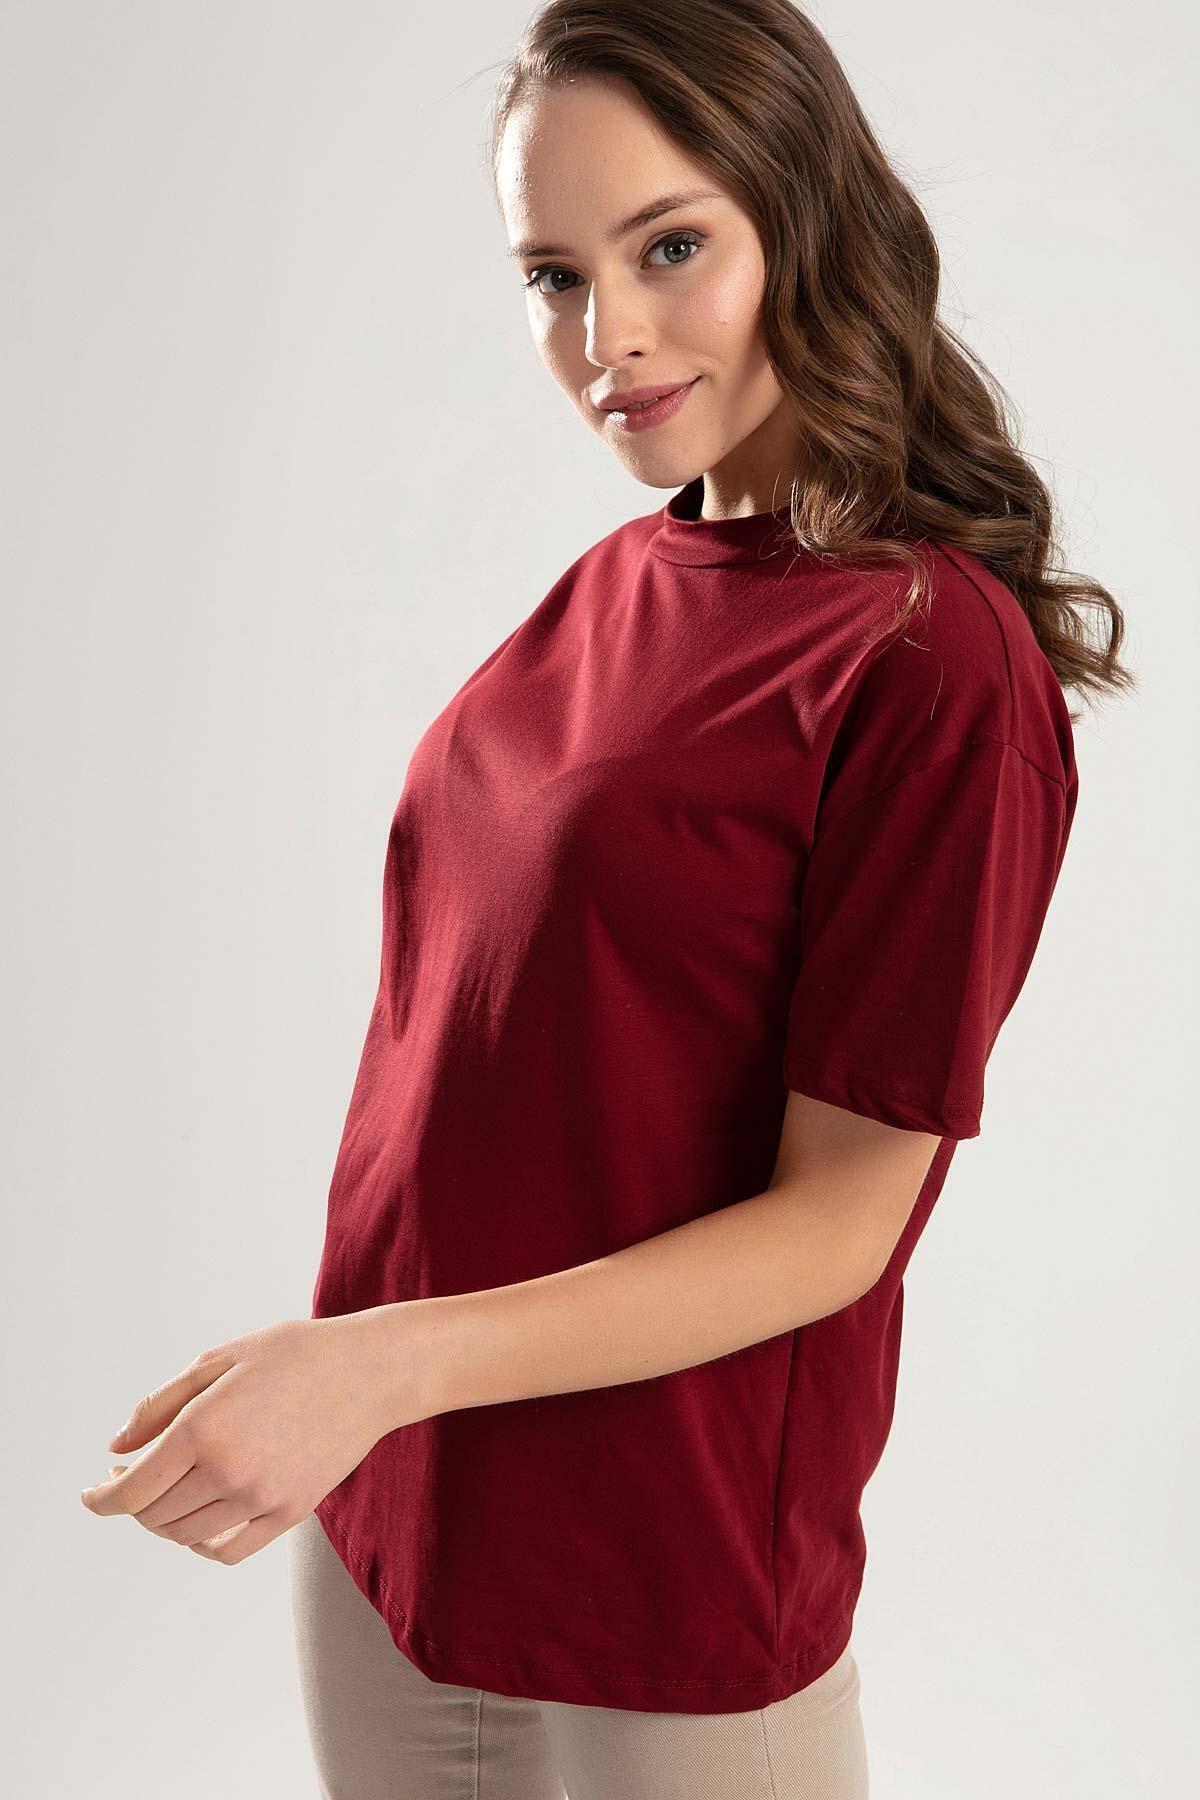 Pattaya Kadın Bordo Dik Yaka Basic Tişört PTTY20S-701 2